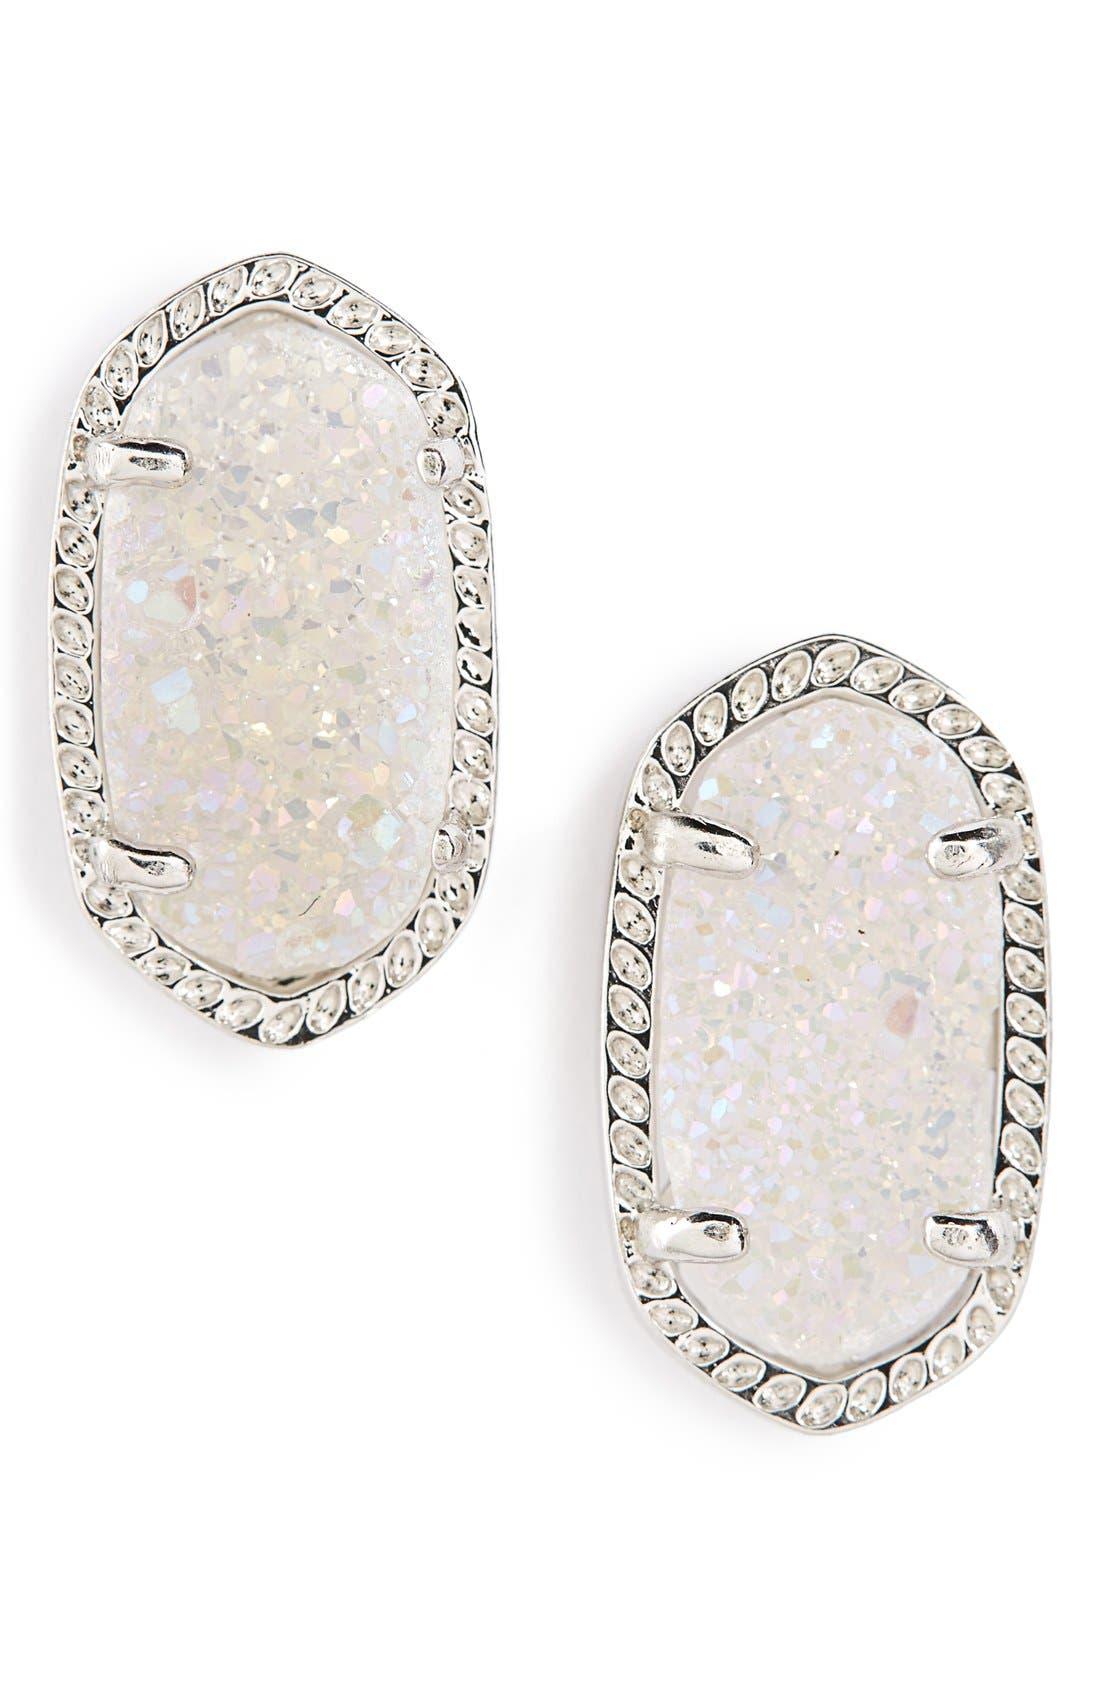 Alternate Image 1 Selected - Kendra Scott Ellie Oval Stone Stud Earrings